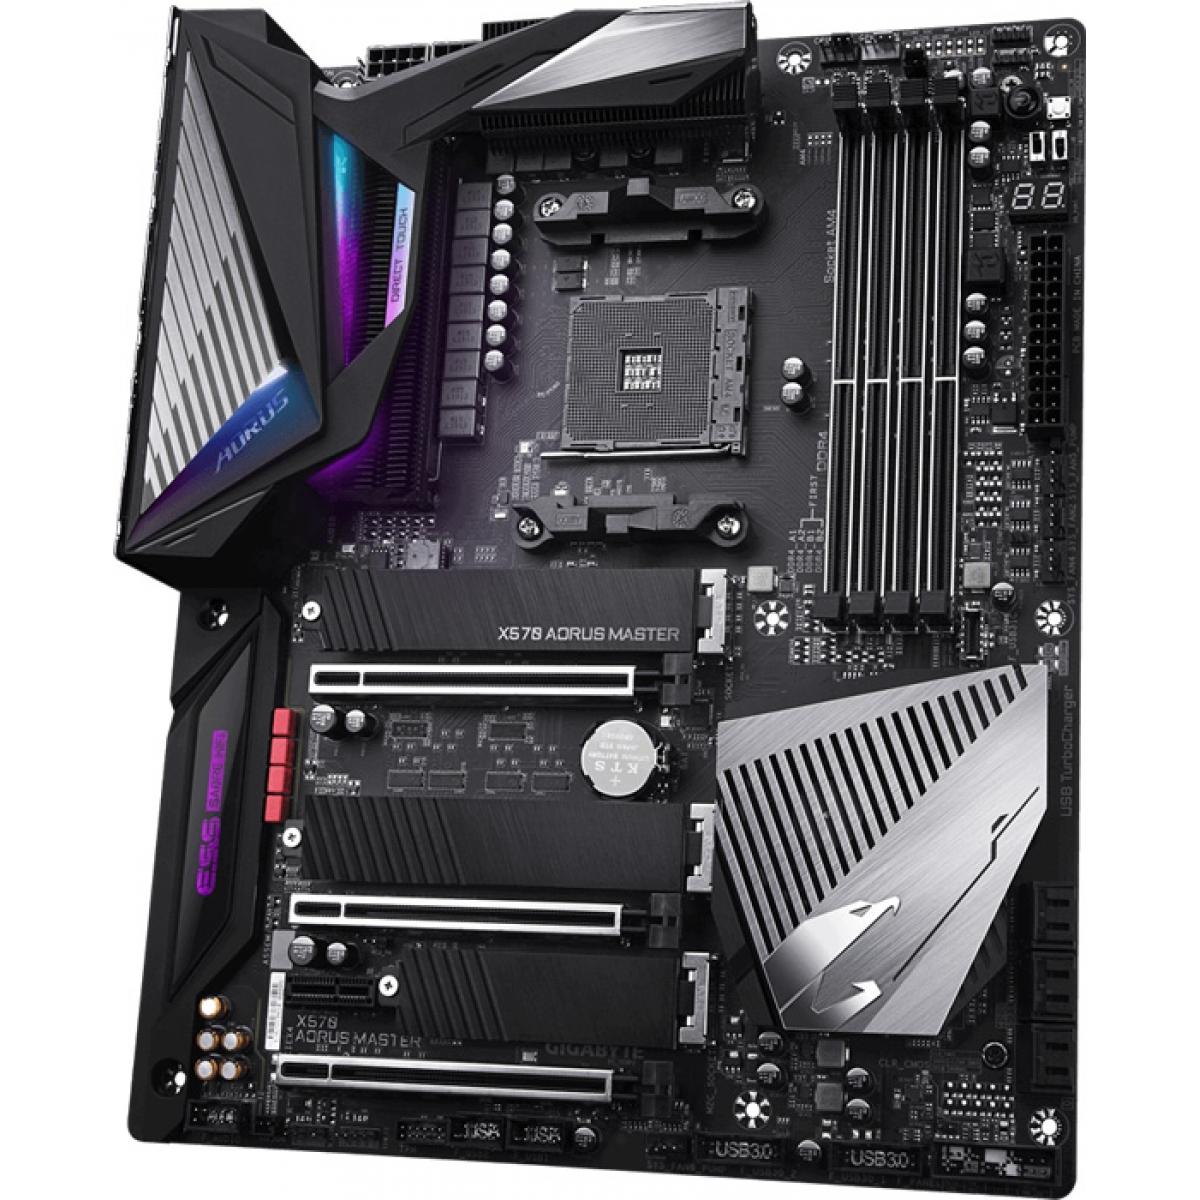 Placa Mãe Gigabyte X570 Aorus Master, Chipset X570, AMD AM4, ATX, DDR4